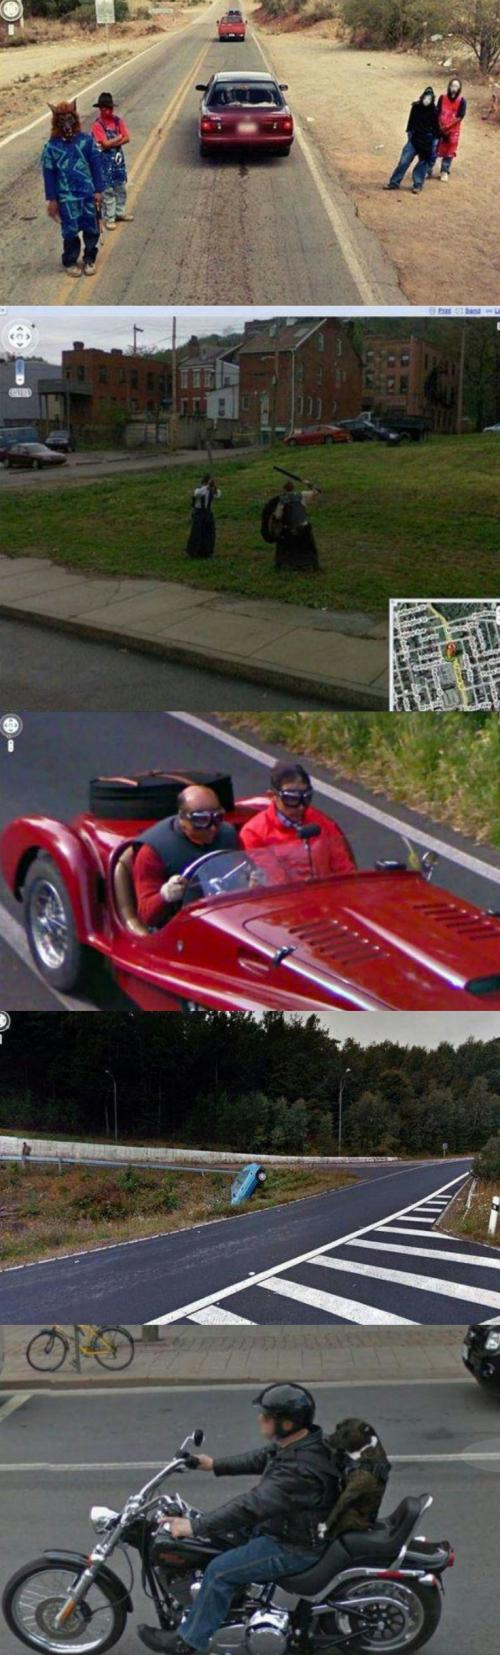 Momentky ze Street view #3